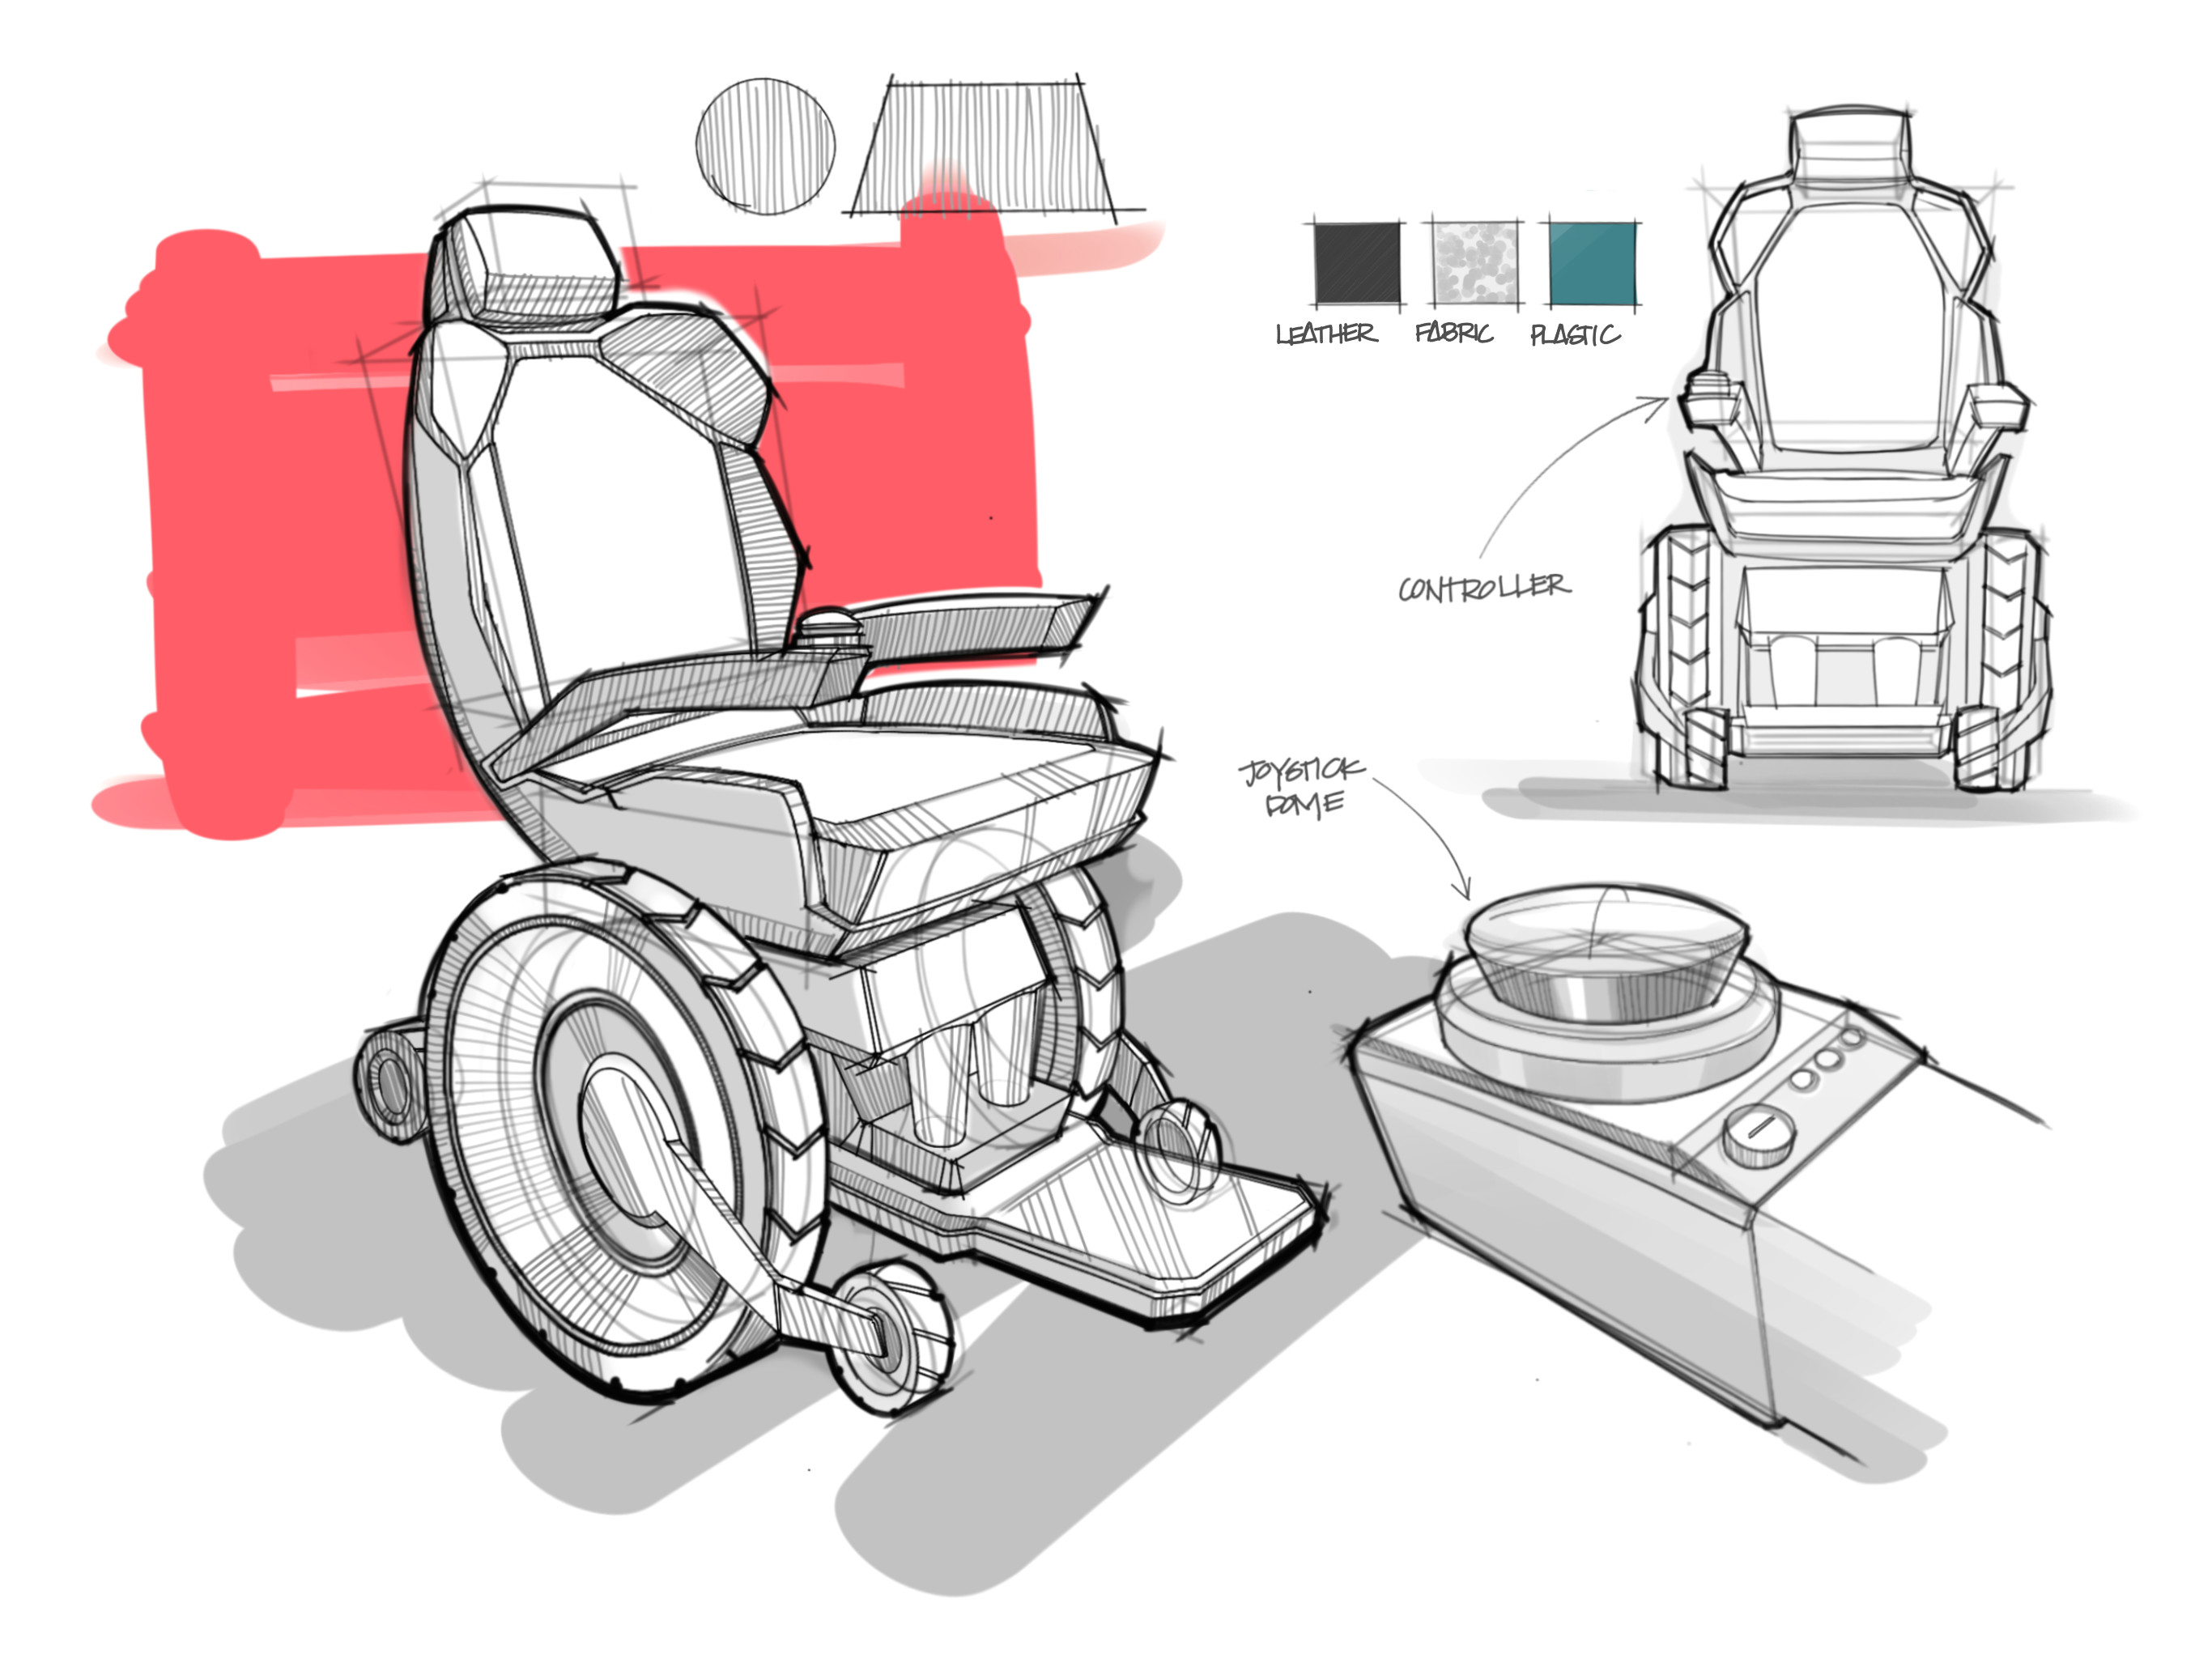 wheelchair sketch industrial design ipad pro procreate drawing render banks design